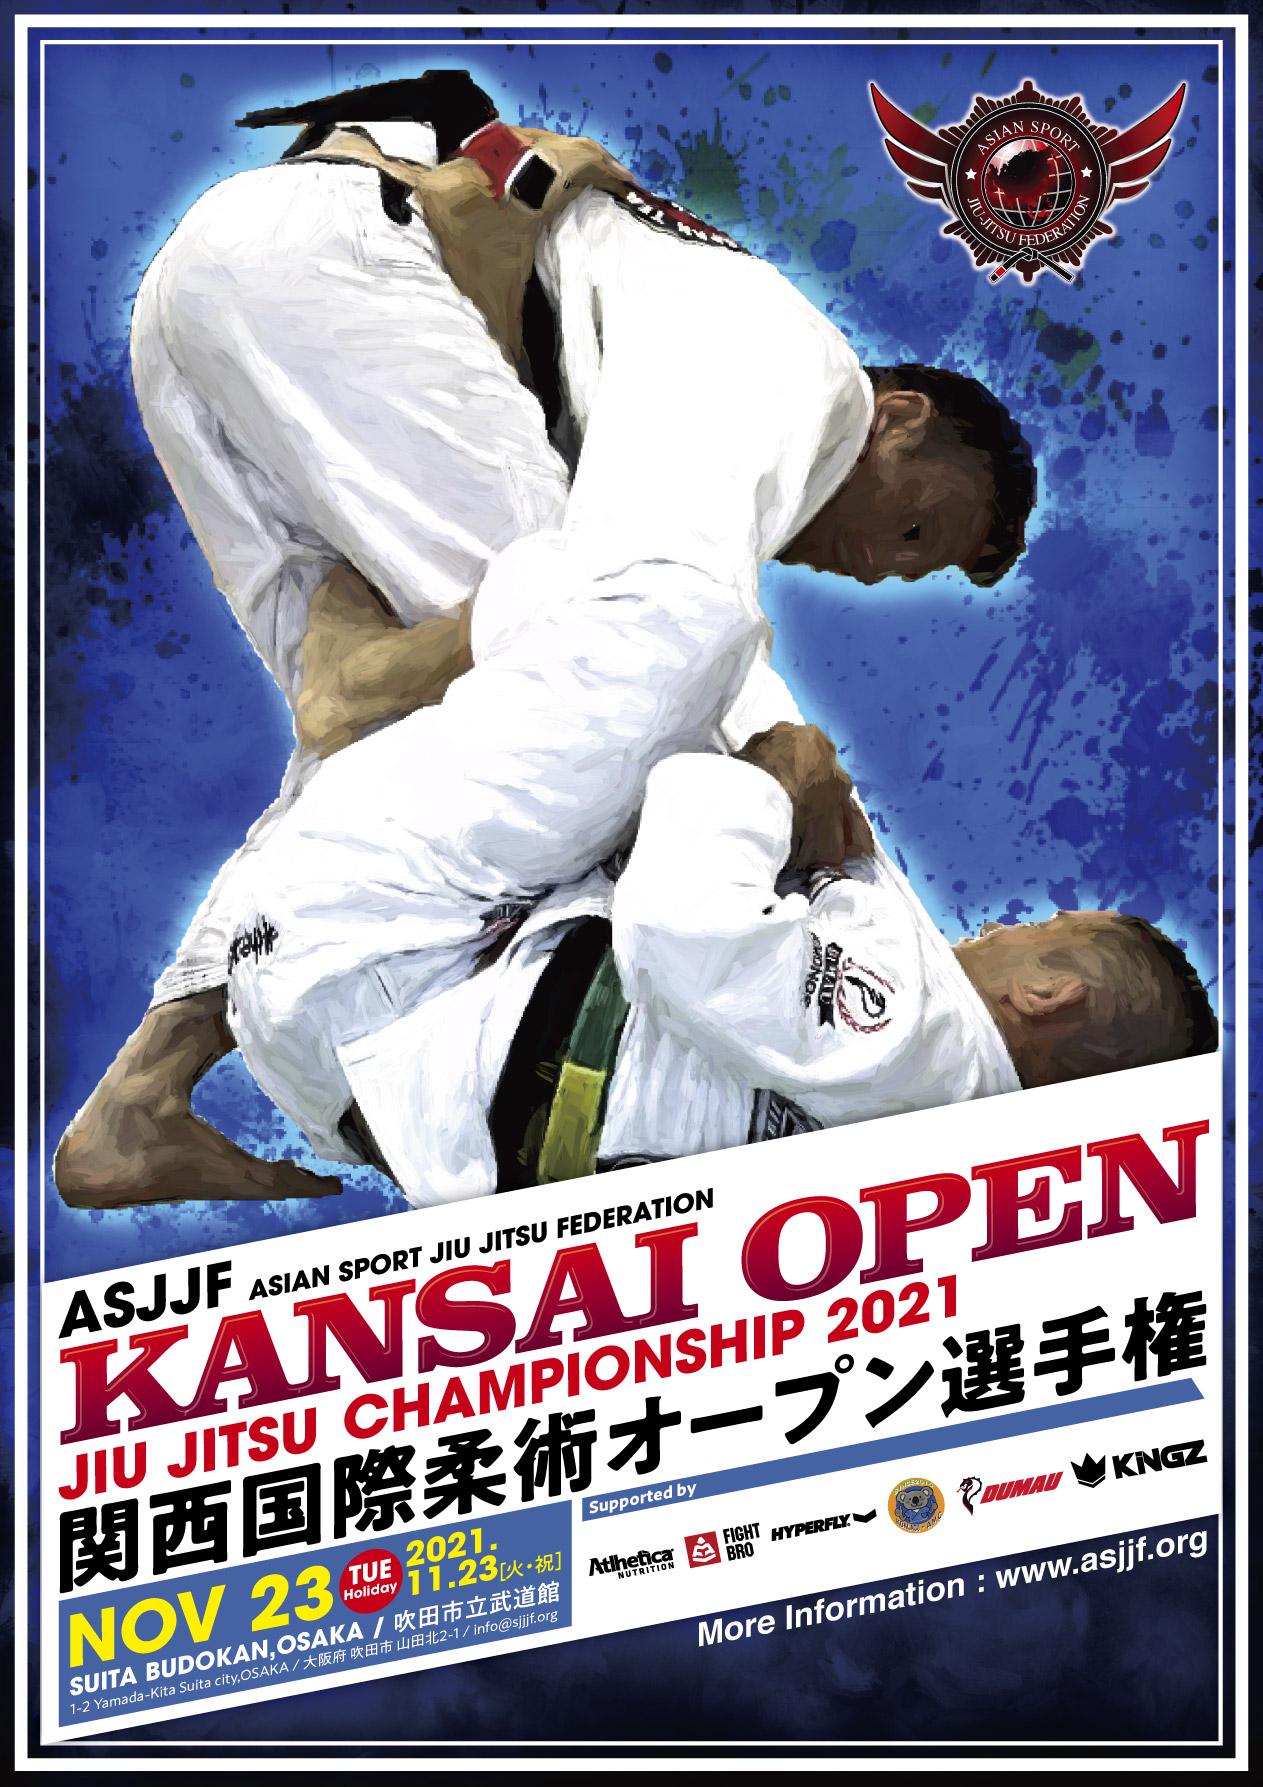 asjjf kansai kids jiu jitsu championship 2021